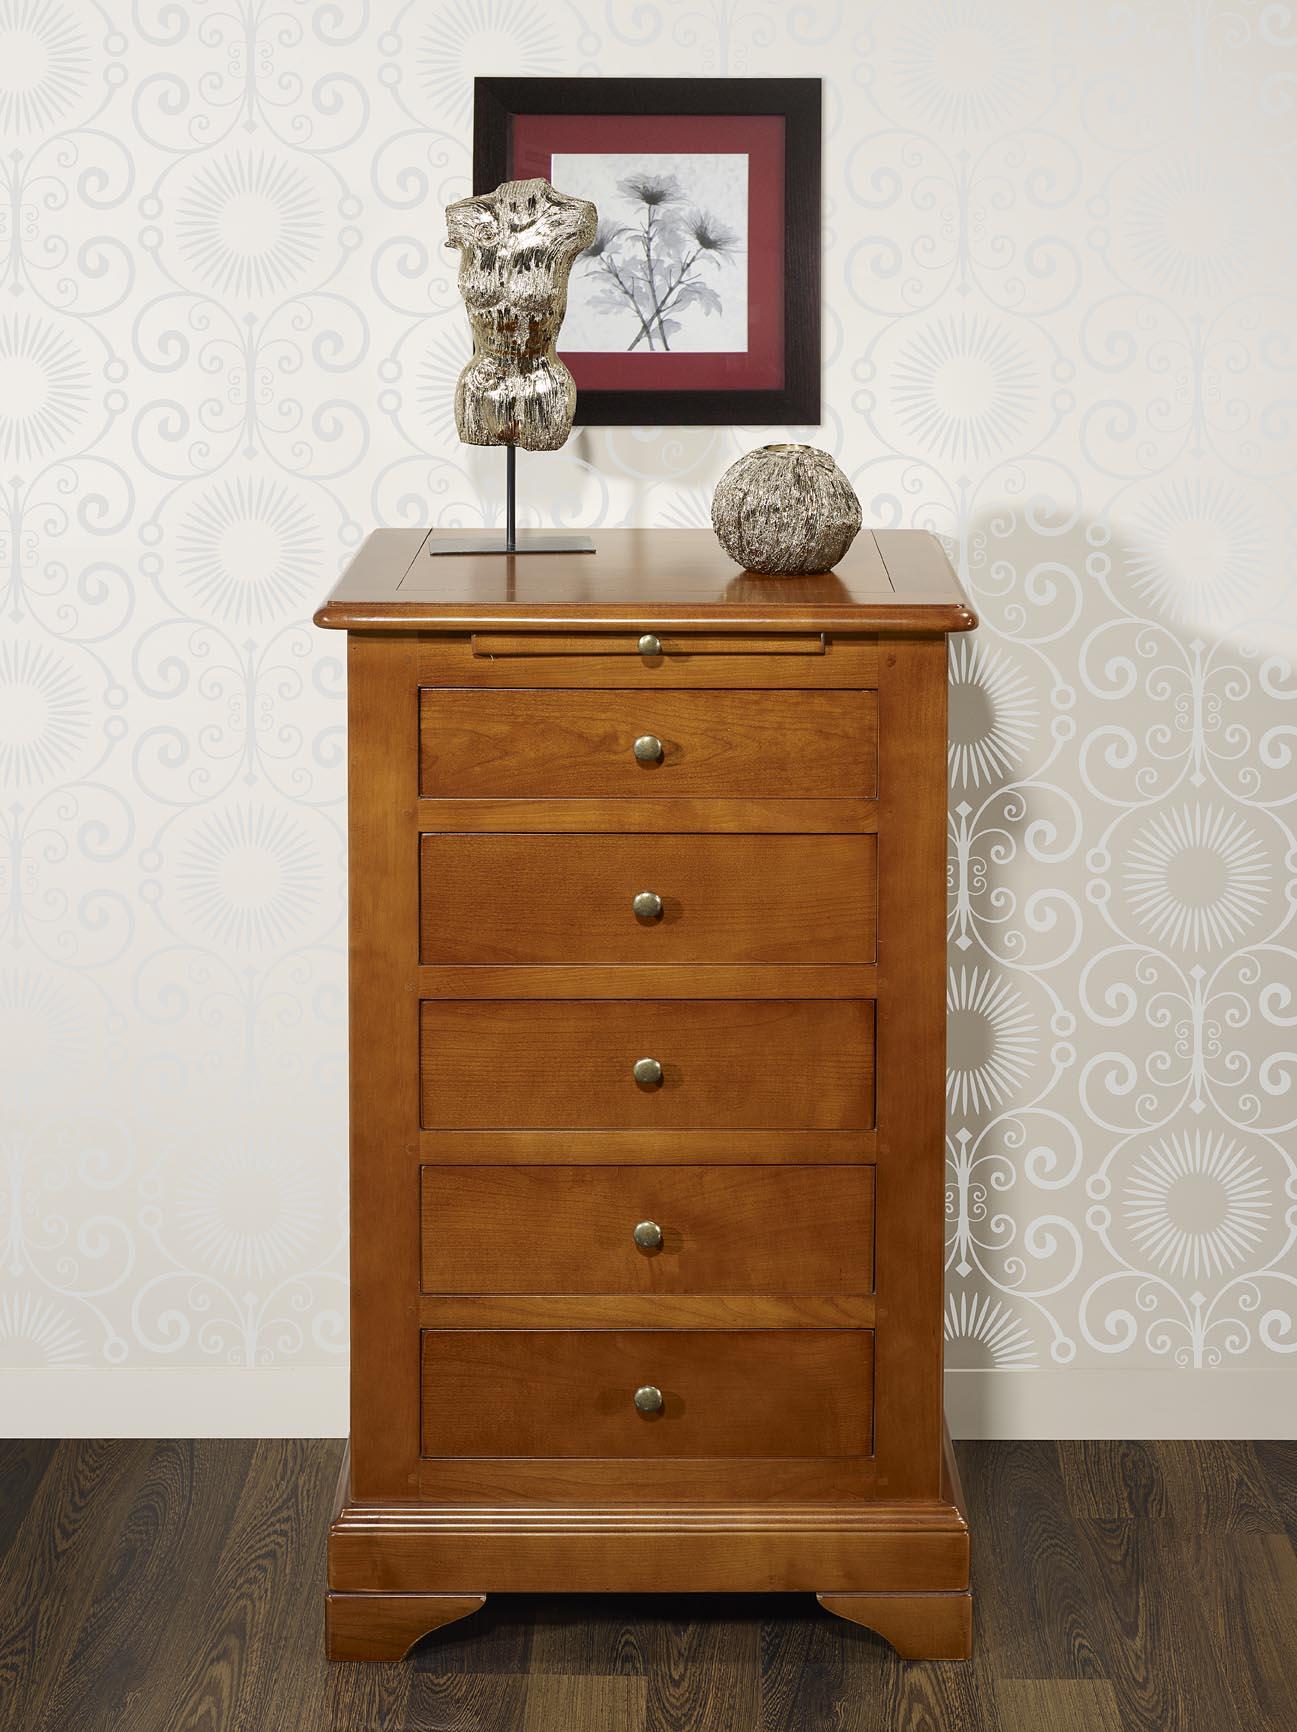 Chiffonnier 5 tiroirs en merisier massif de style louis philippe meuble en merisier - Petit meuble merisier louis philippe ...